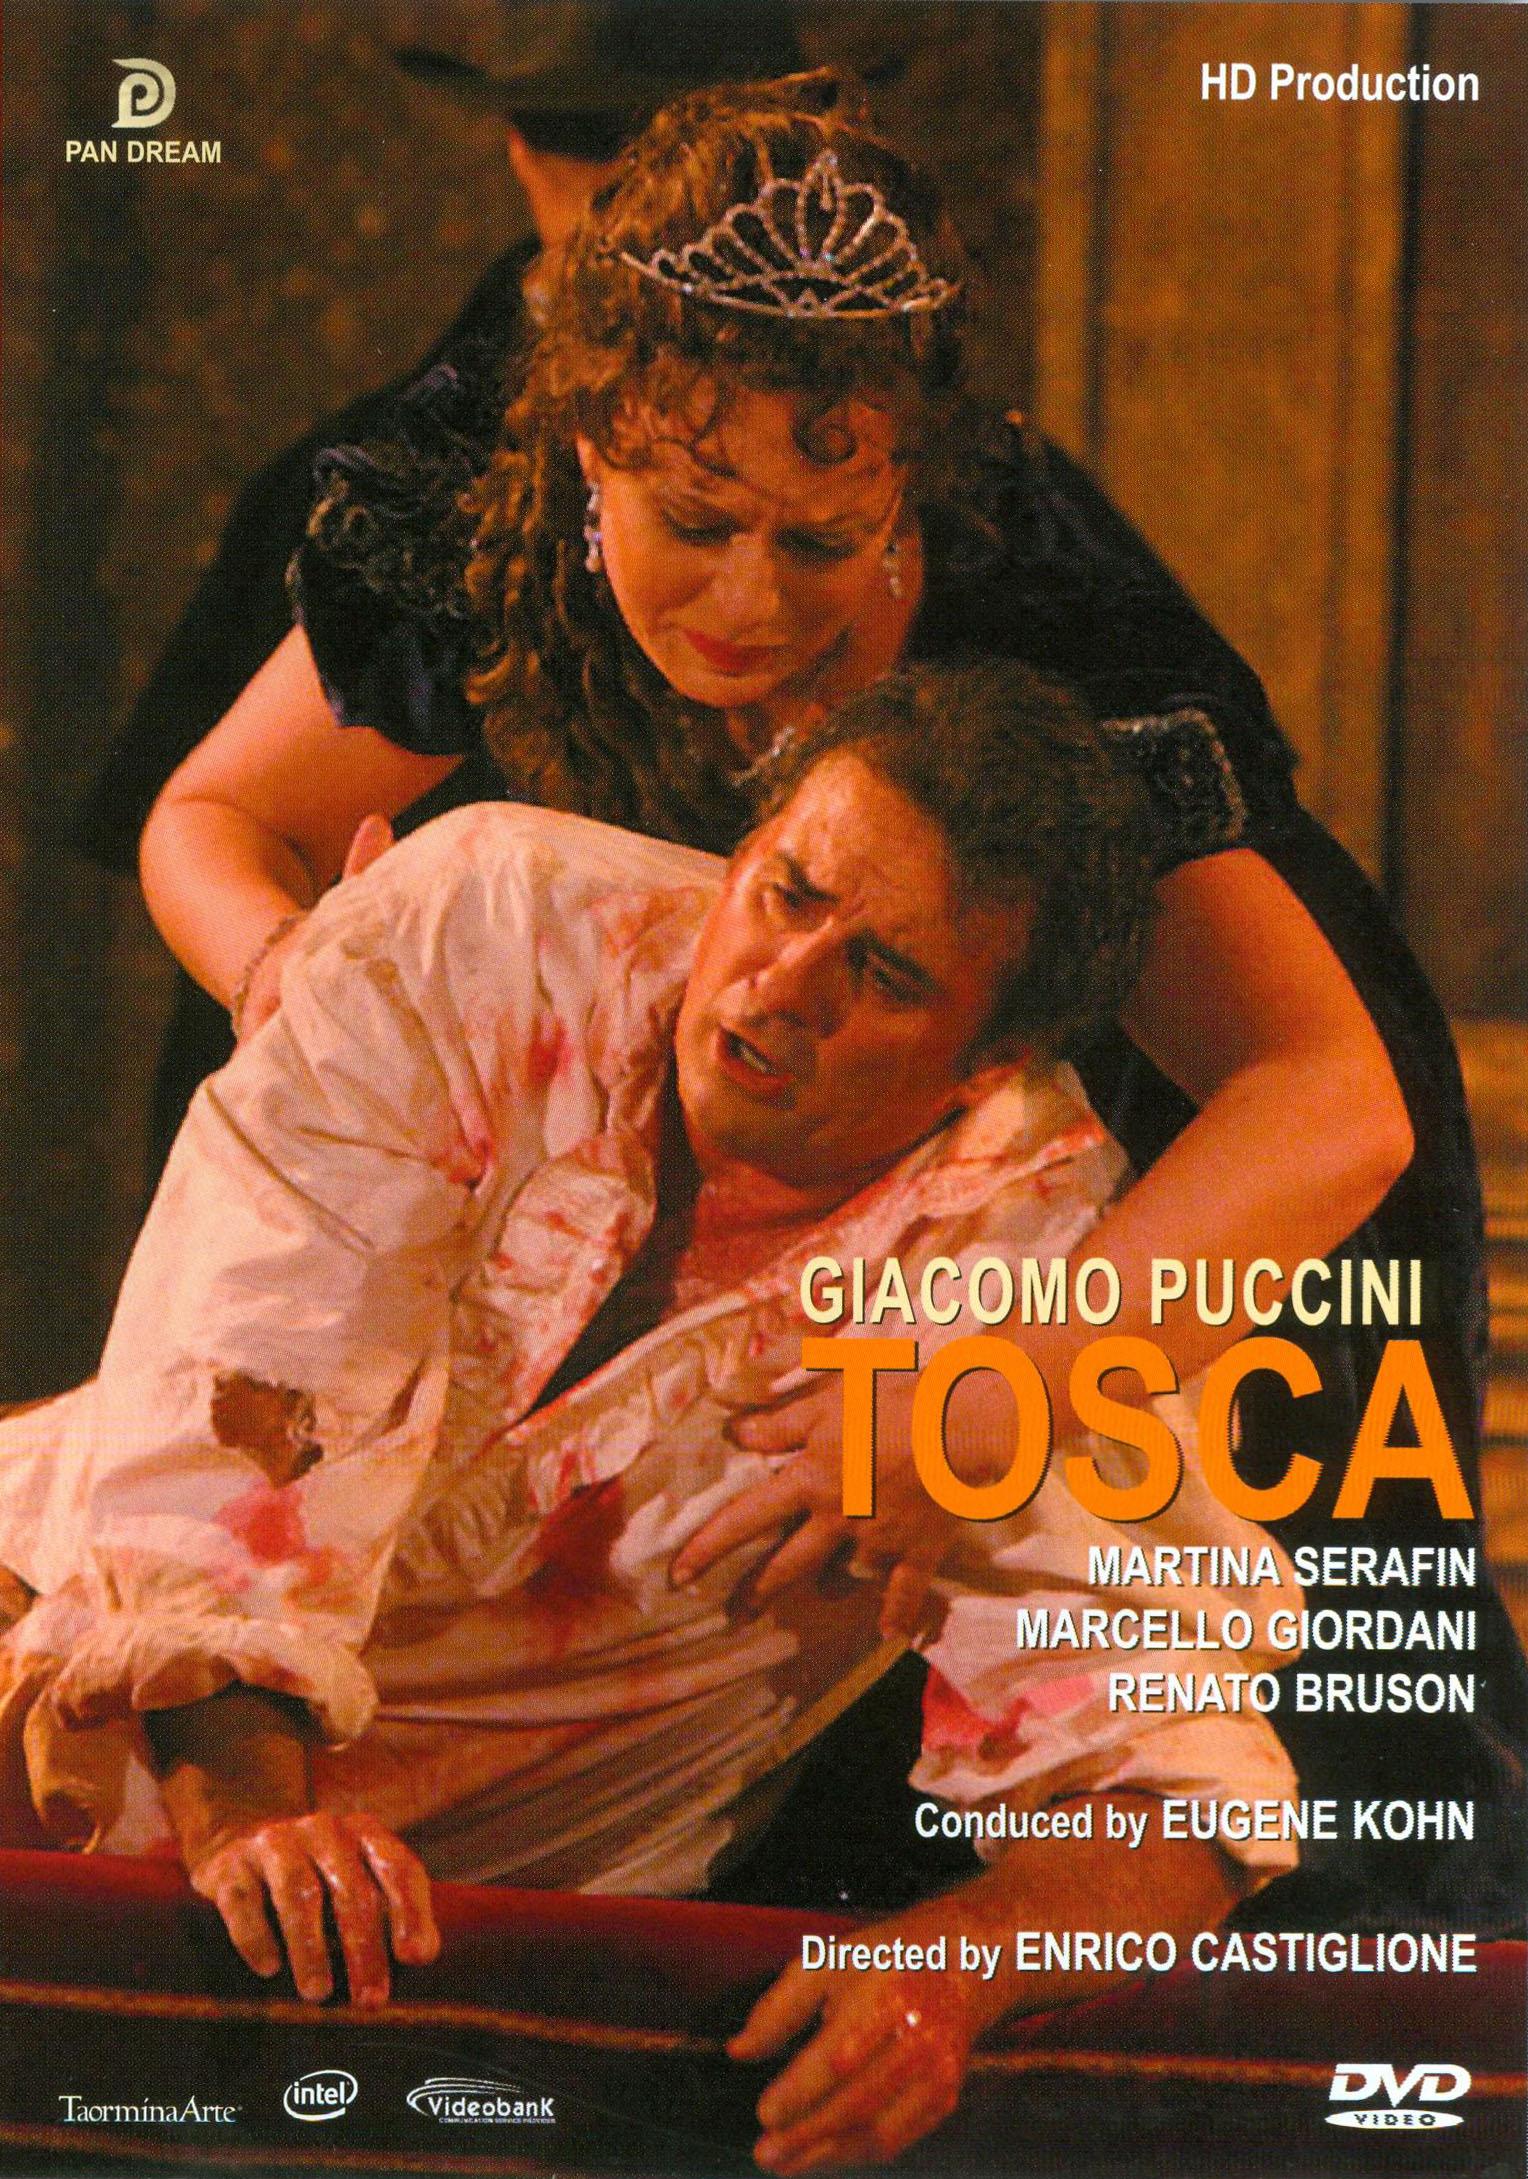 Tosca (Greek Theatre of Taormina)